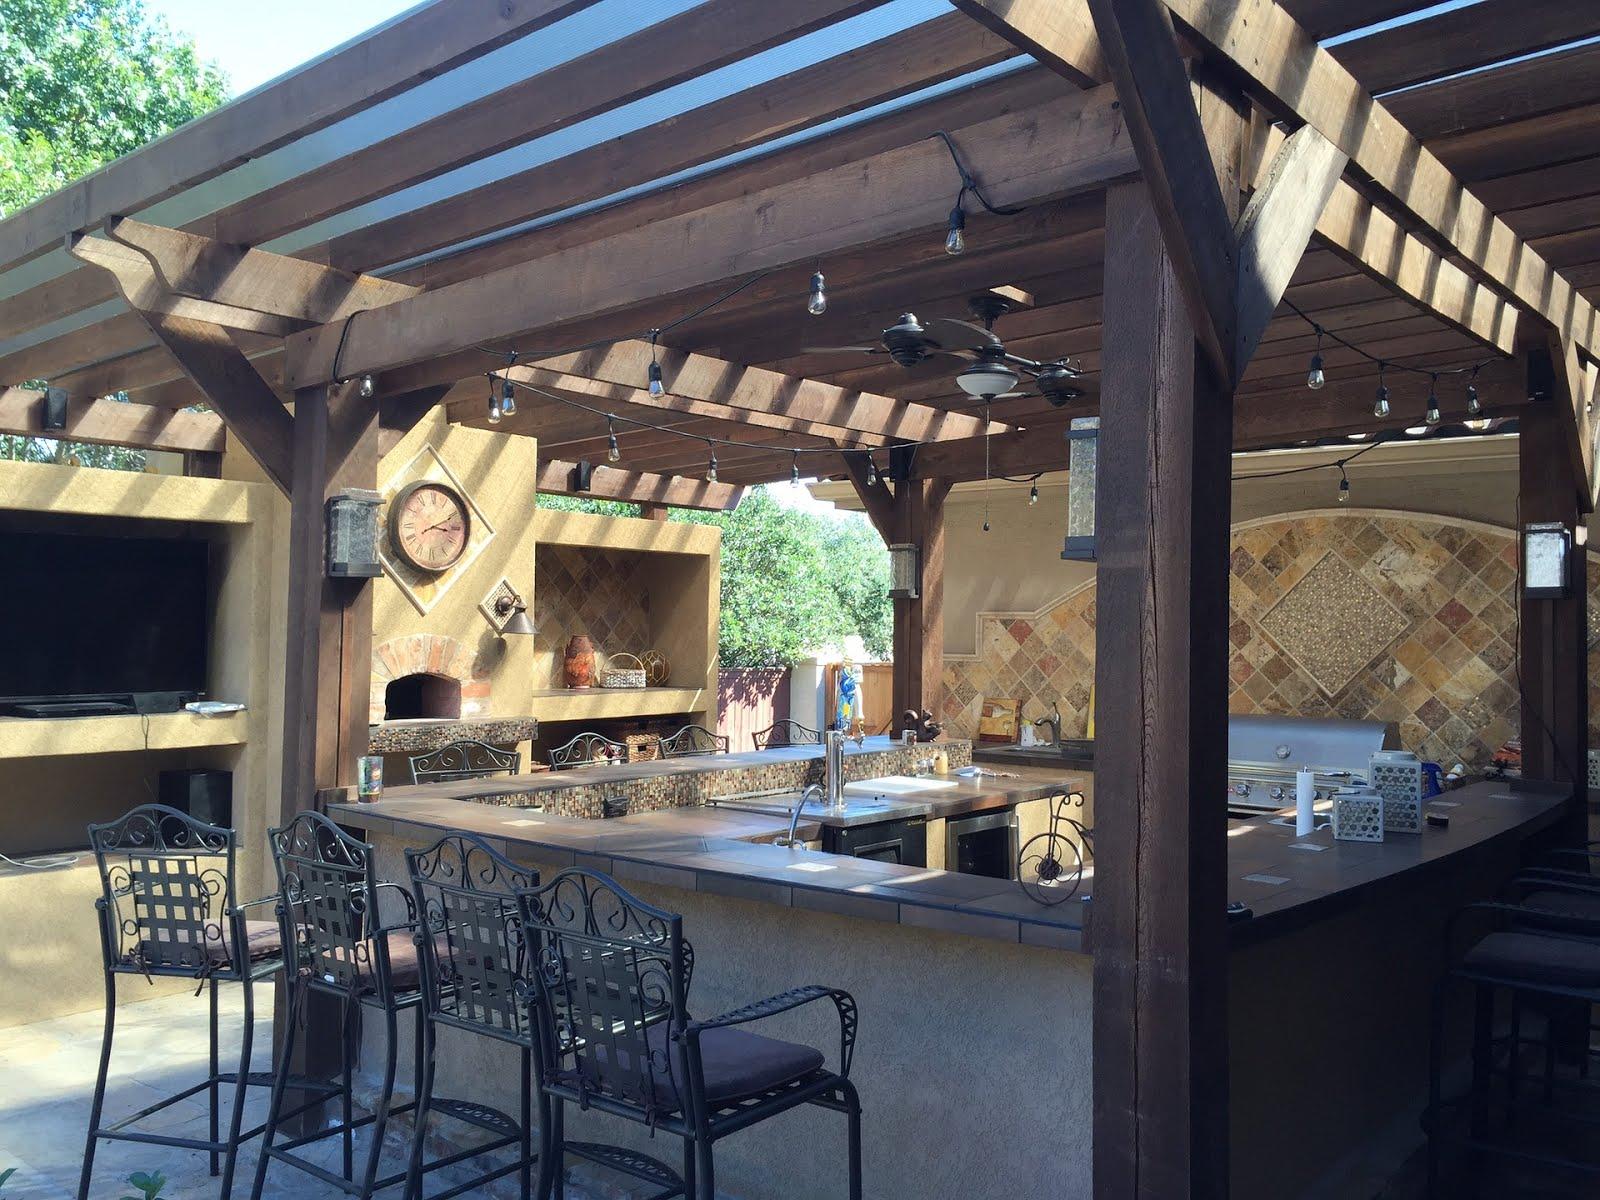 Full Size of Mobile Outdoorküche Outdoorkche 10 Top Tipps Küche Wohnzimmer Mobile Outdoorküche